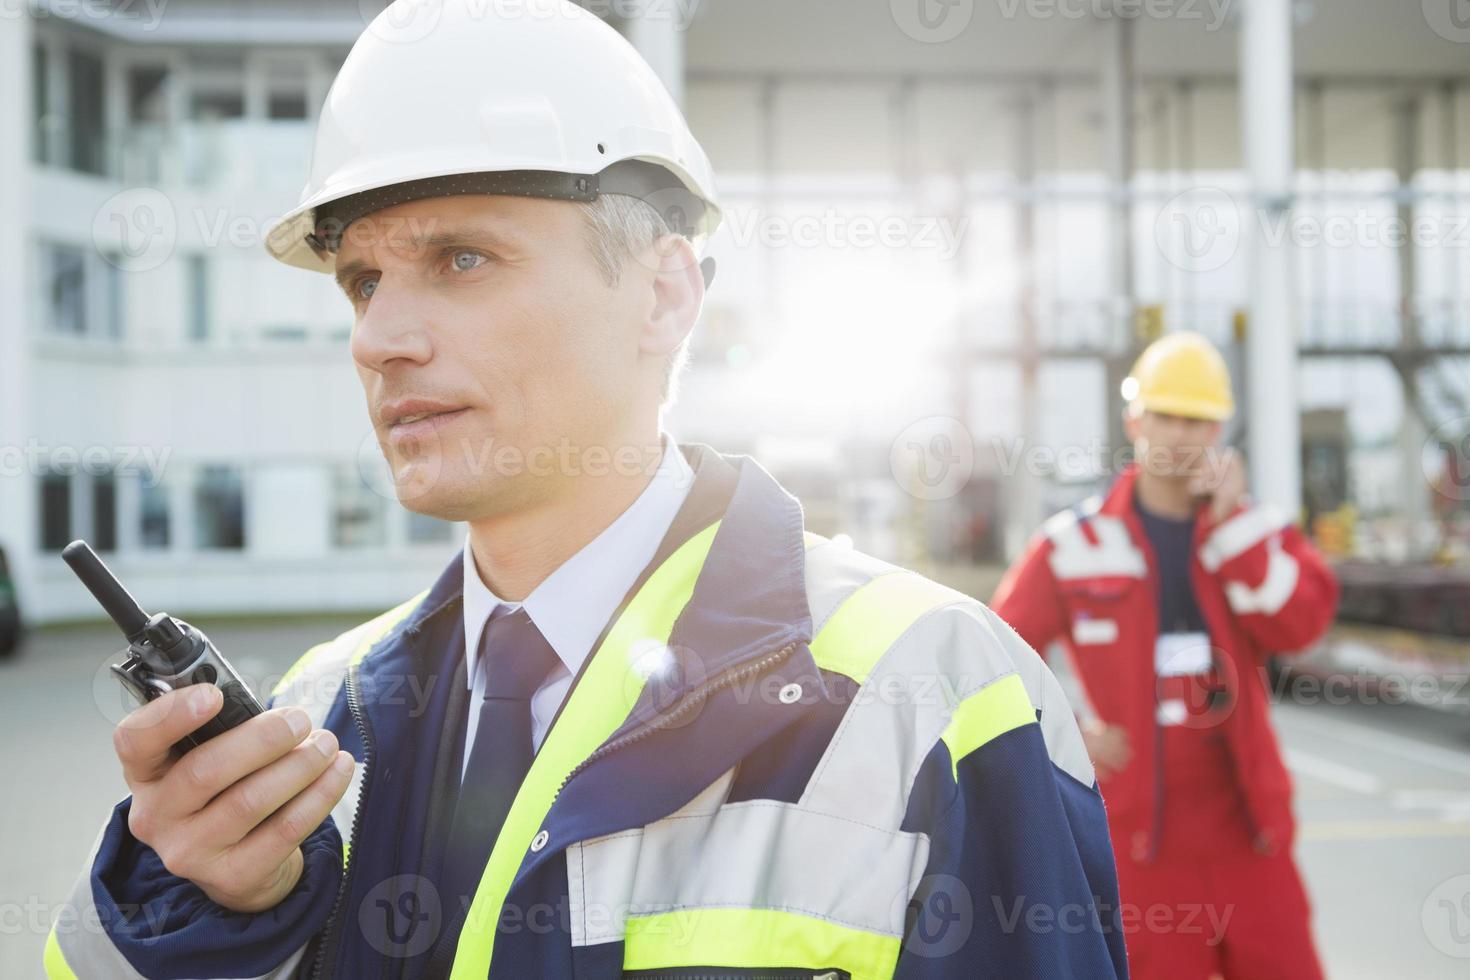 mannelijke werknemer met behulp van walkie-talkie met collega op achtergrond foto